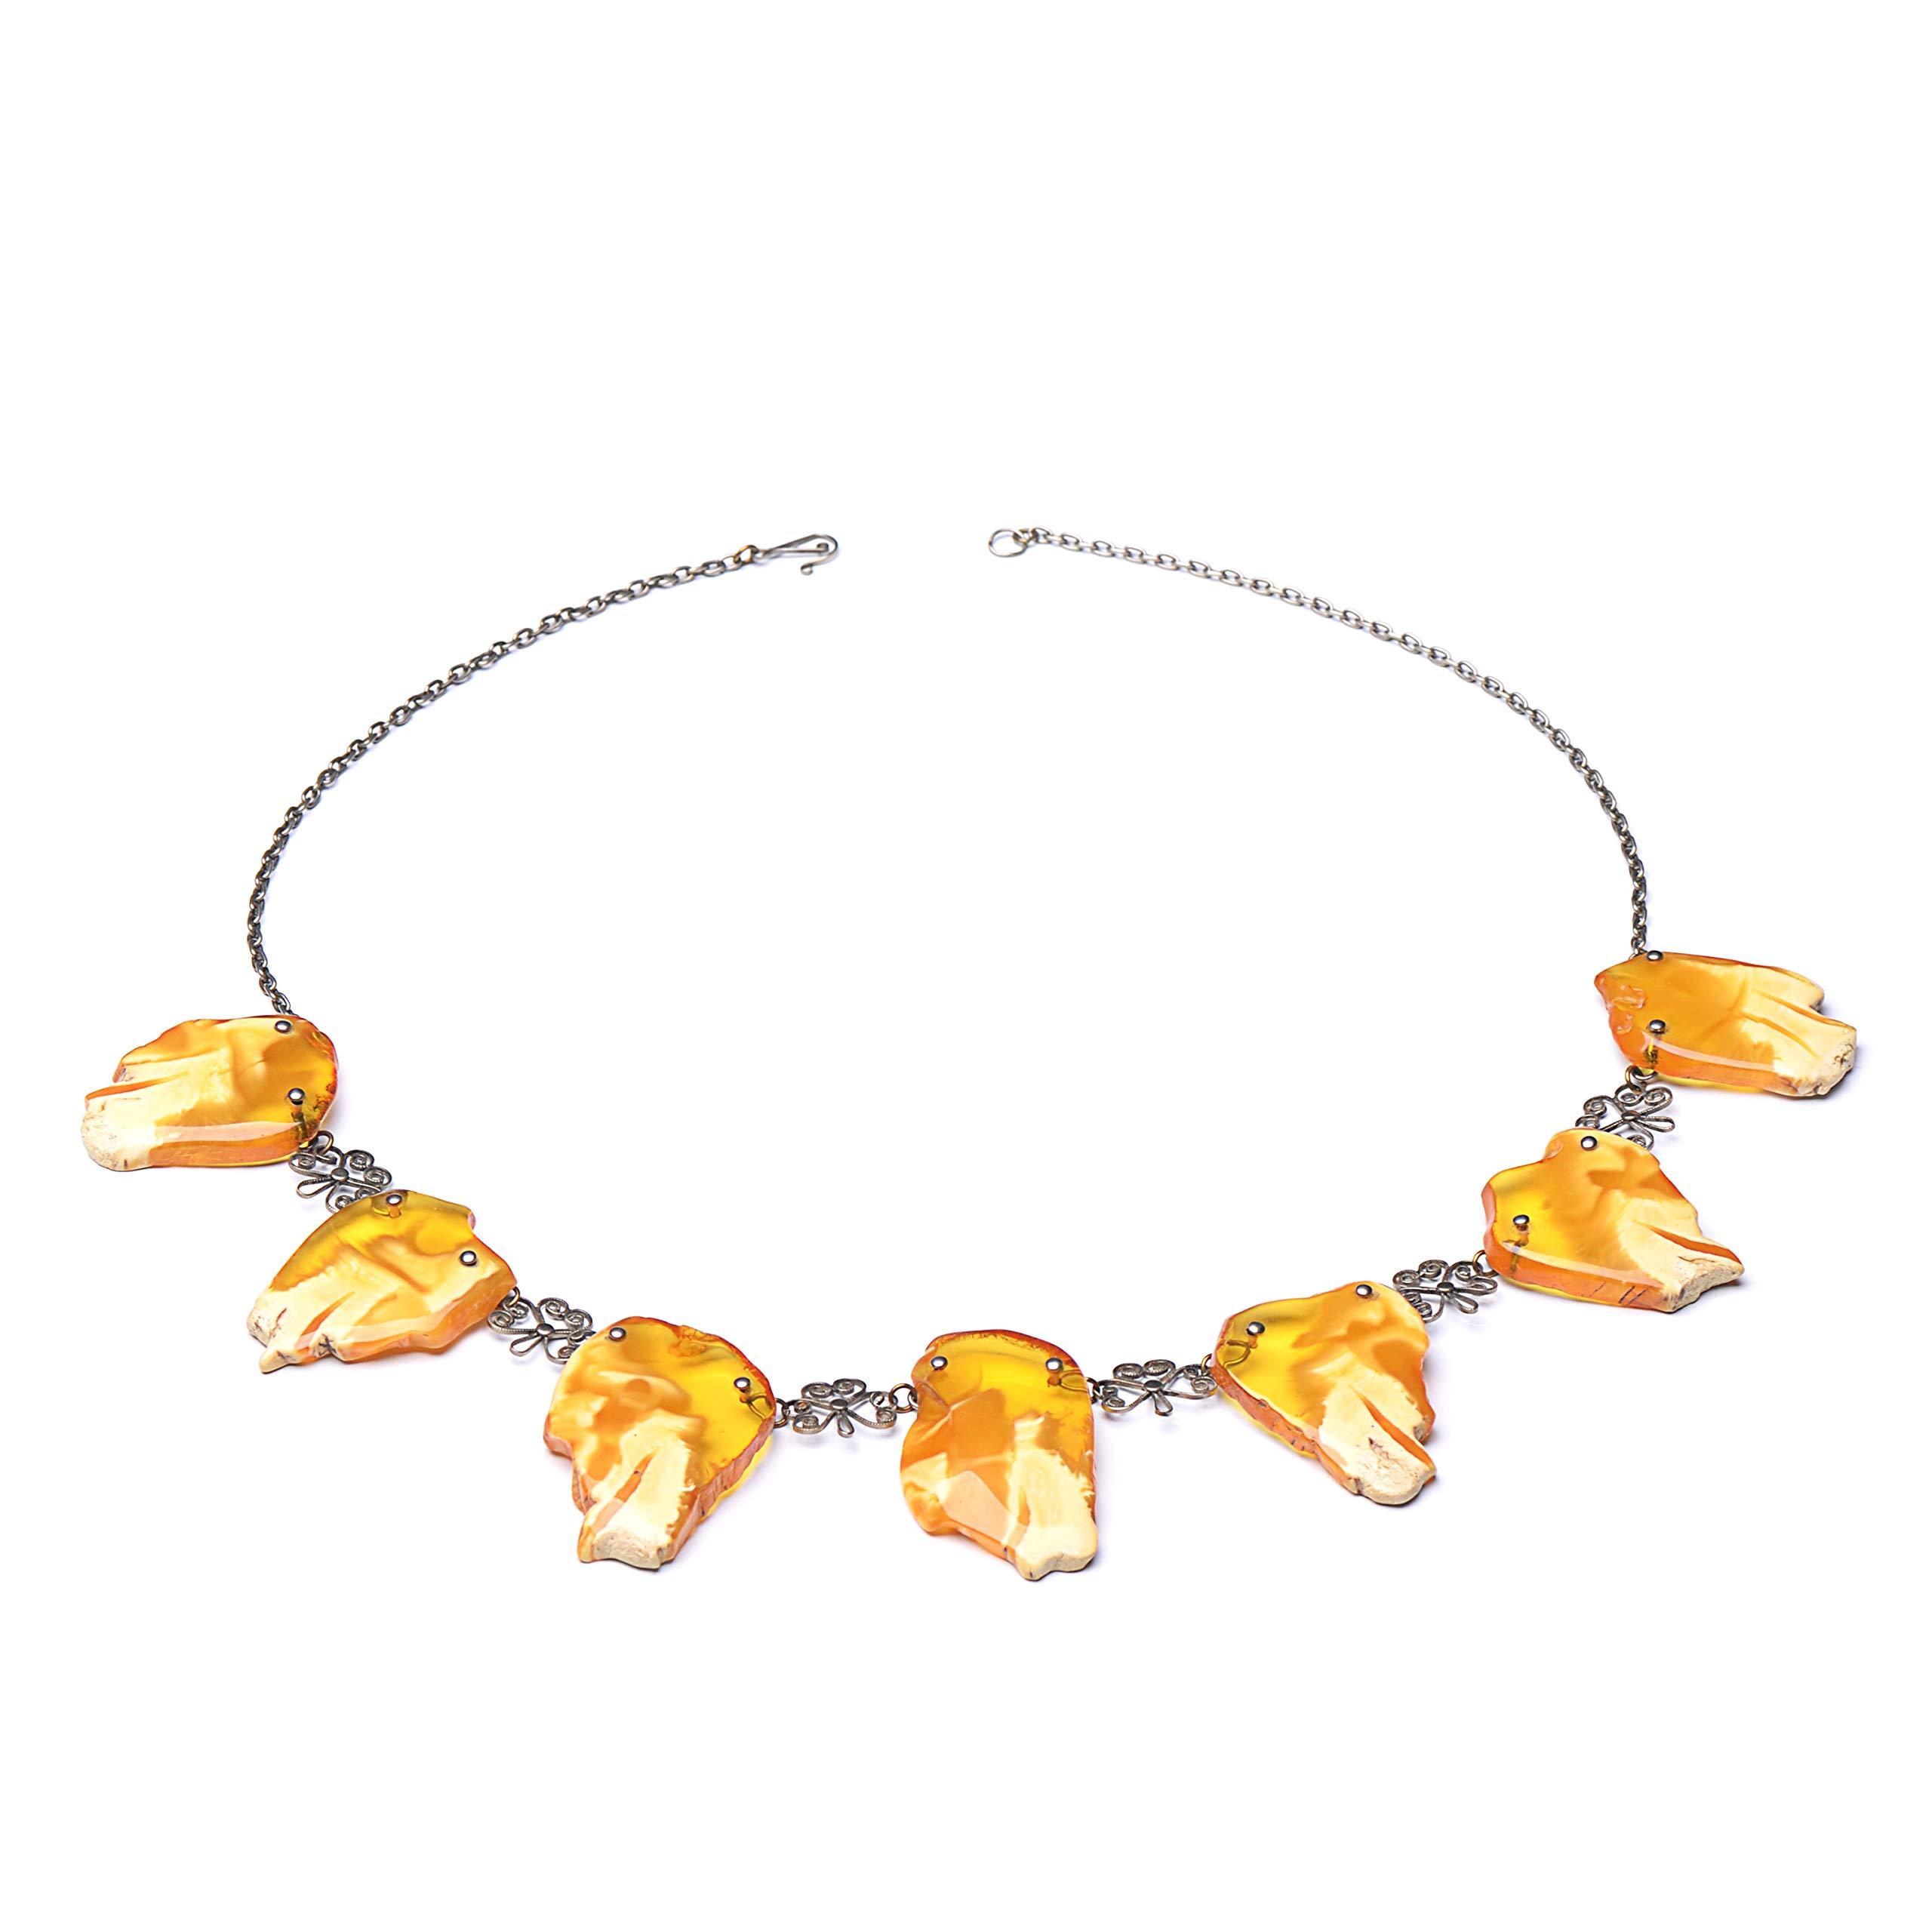 Elegant Unique Baltic Amber Necklace - Vintage Amber Necklace - Unique Piece - Amber Jewelry by Genuine Amber